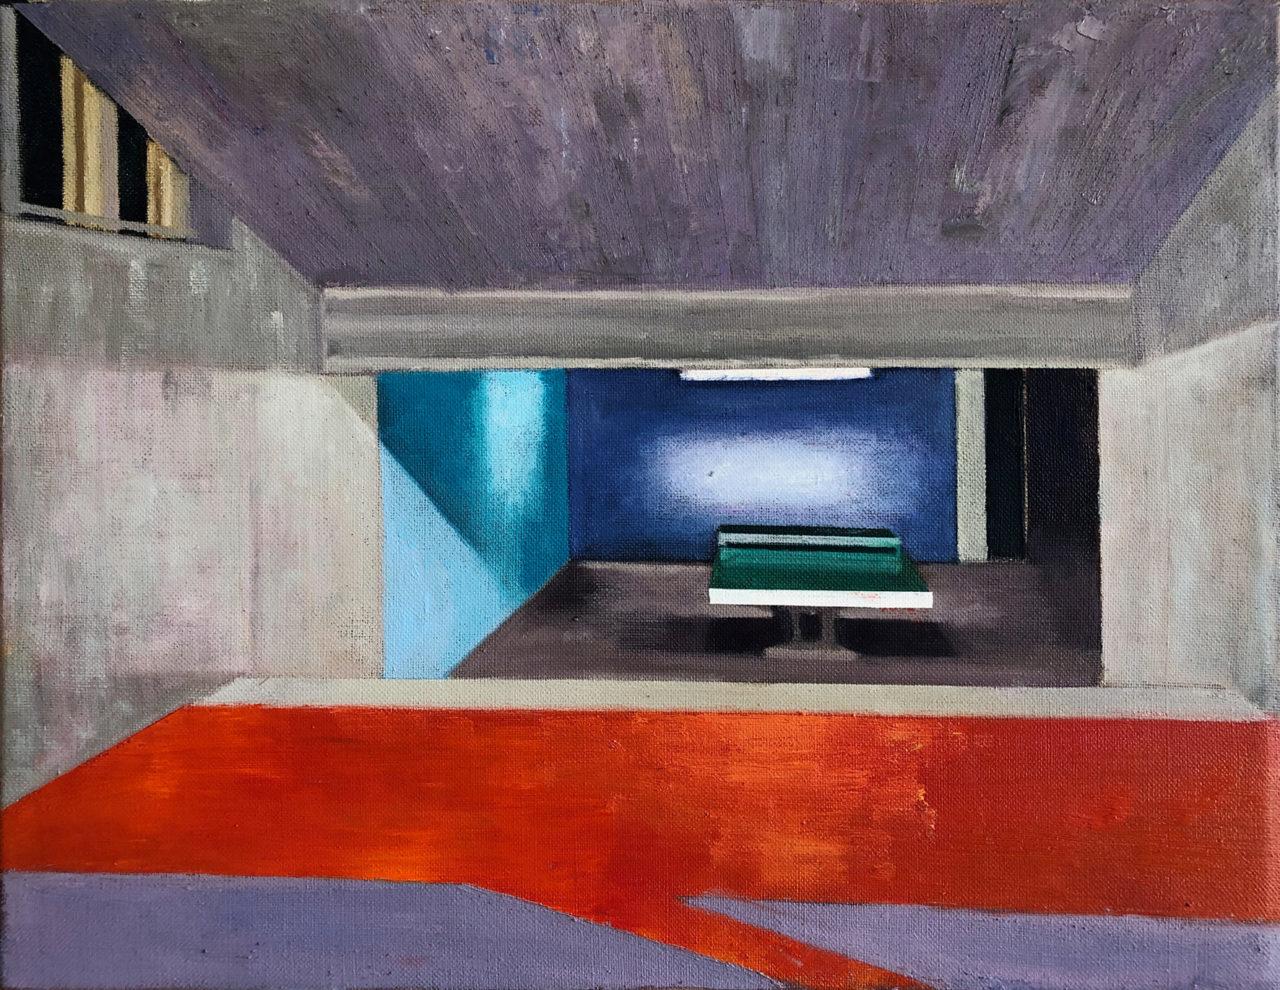 Martin Kasper, Pingpong 2, 2020, 35 x 45 cm, Öl auf Leinwand, courtesy the artist